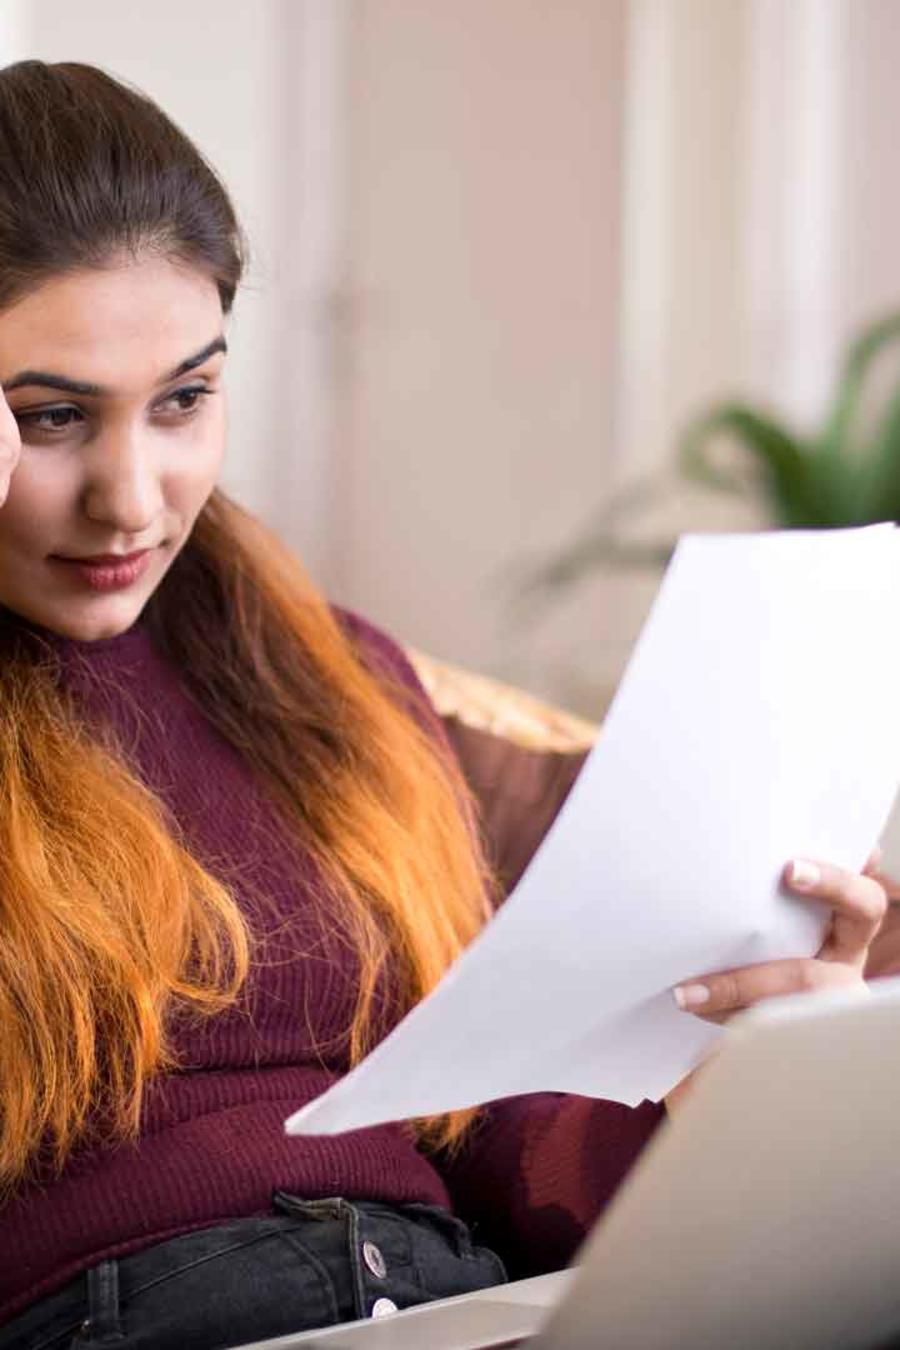 Programas para saldar préstamos estudiantiles